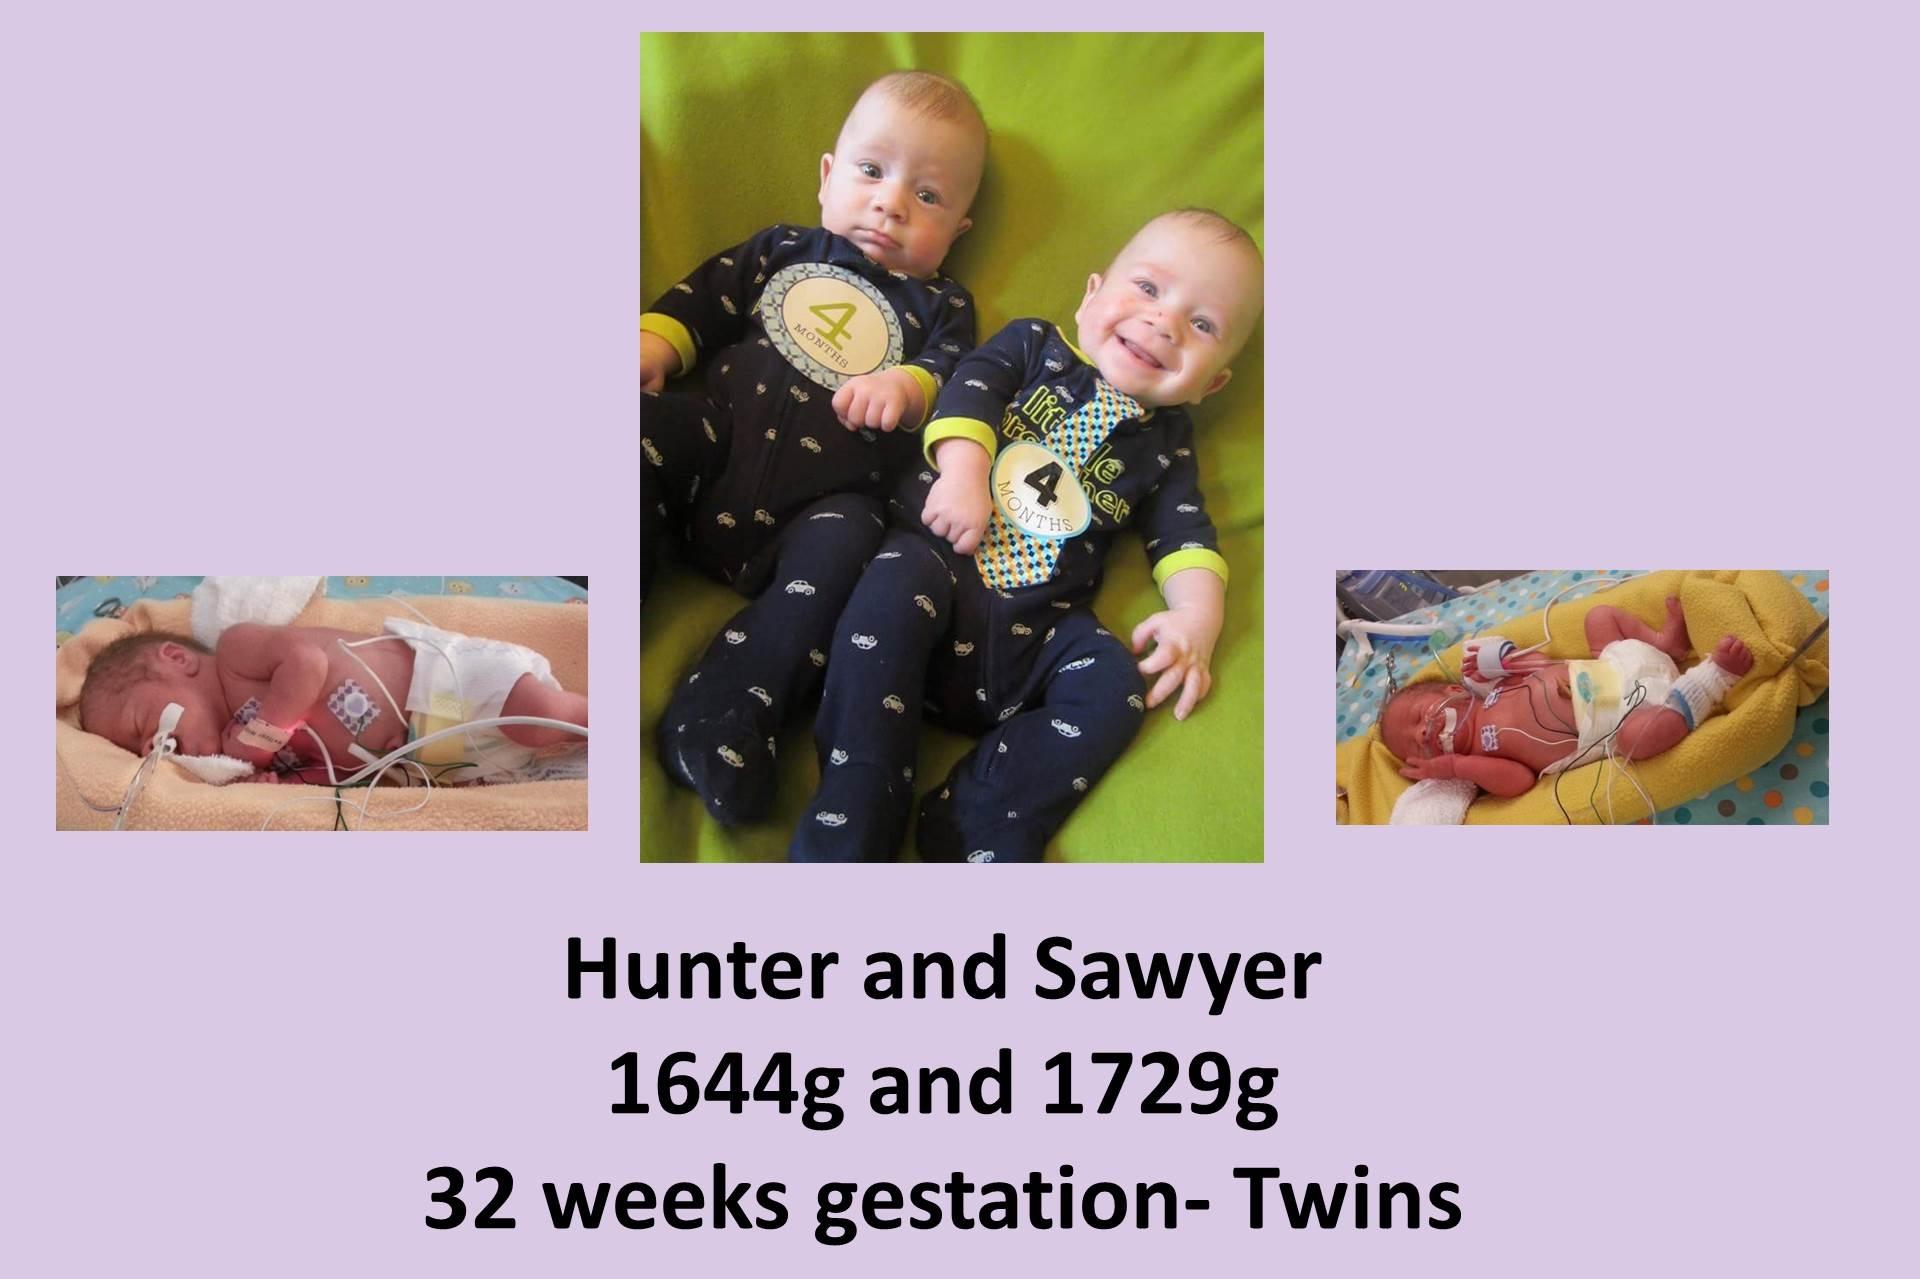 Hallway of Hope: Hunter & Sawyer